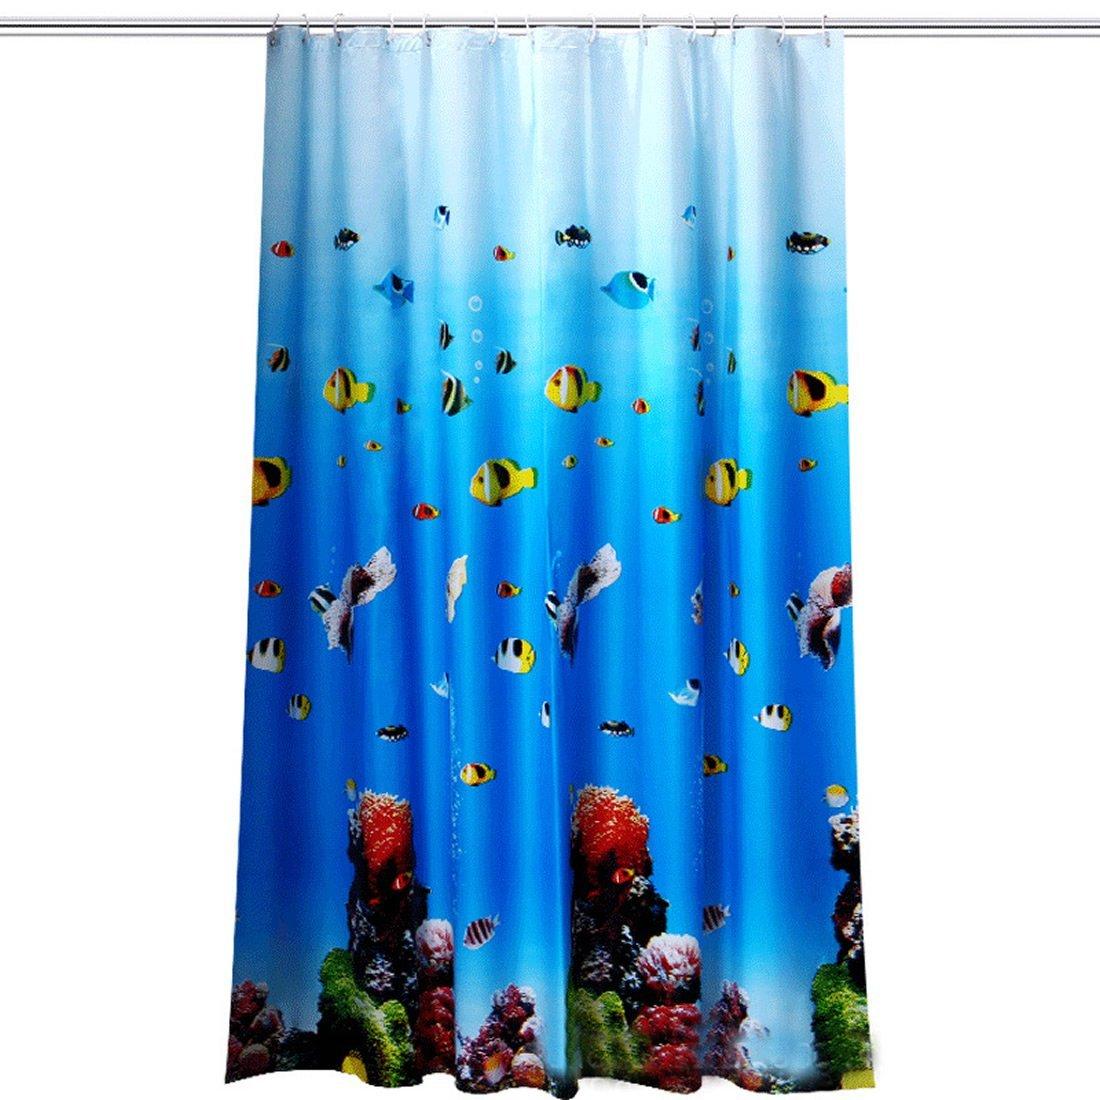 PEVA Tenda da doccia impermeabile spessa Mehltau stile europeo tenda da doccia invio ganci tenda doccia Ring Oceano World, Poliestere, 80x180cm MANYYSI